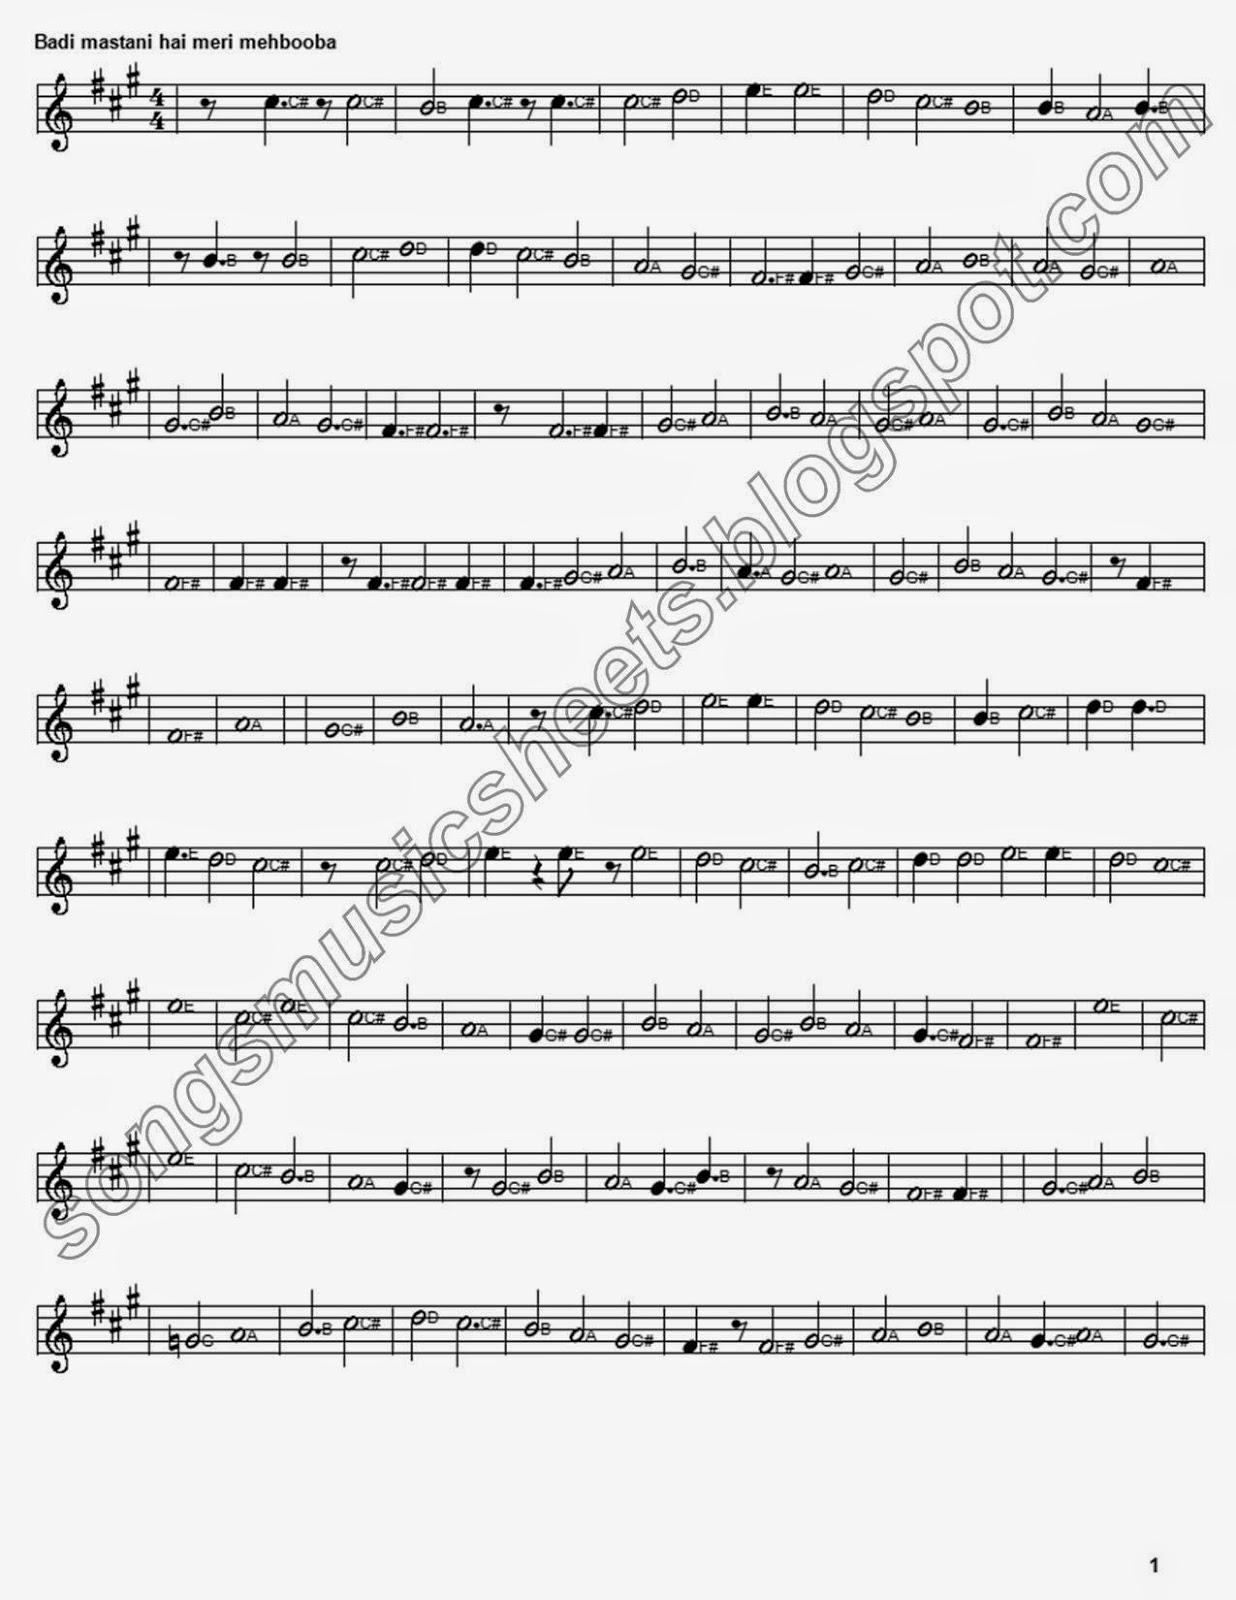 Badi mastaani hai meri mehbooba Piano Music Sheet